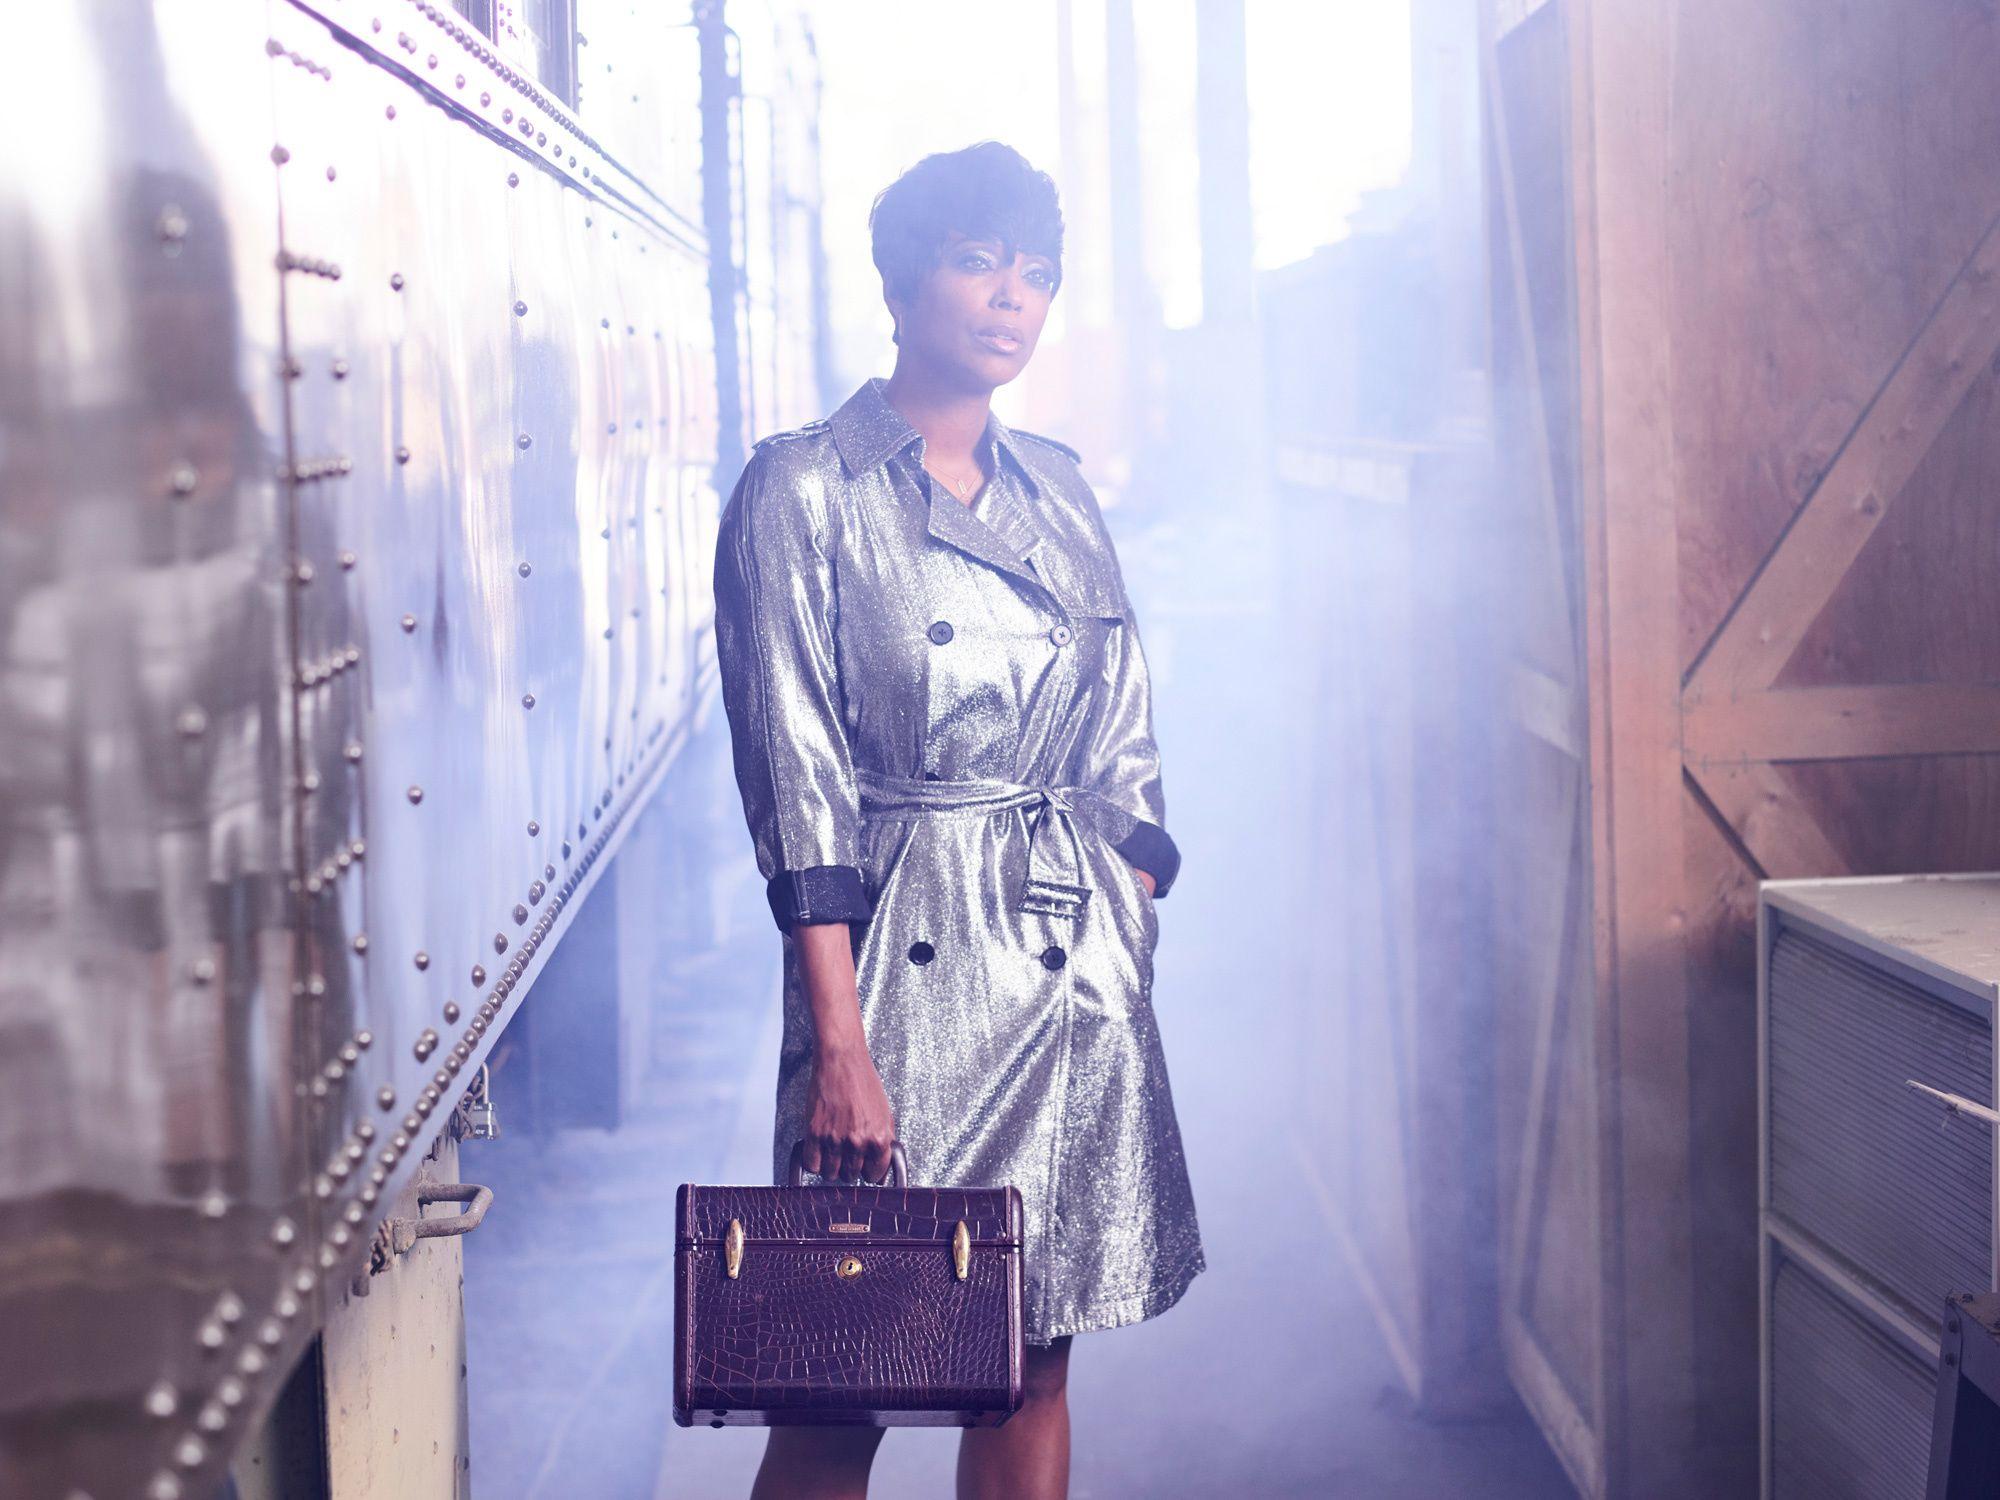 Aisha Tyler standing on train platform.